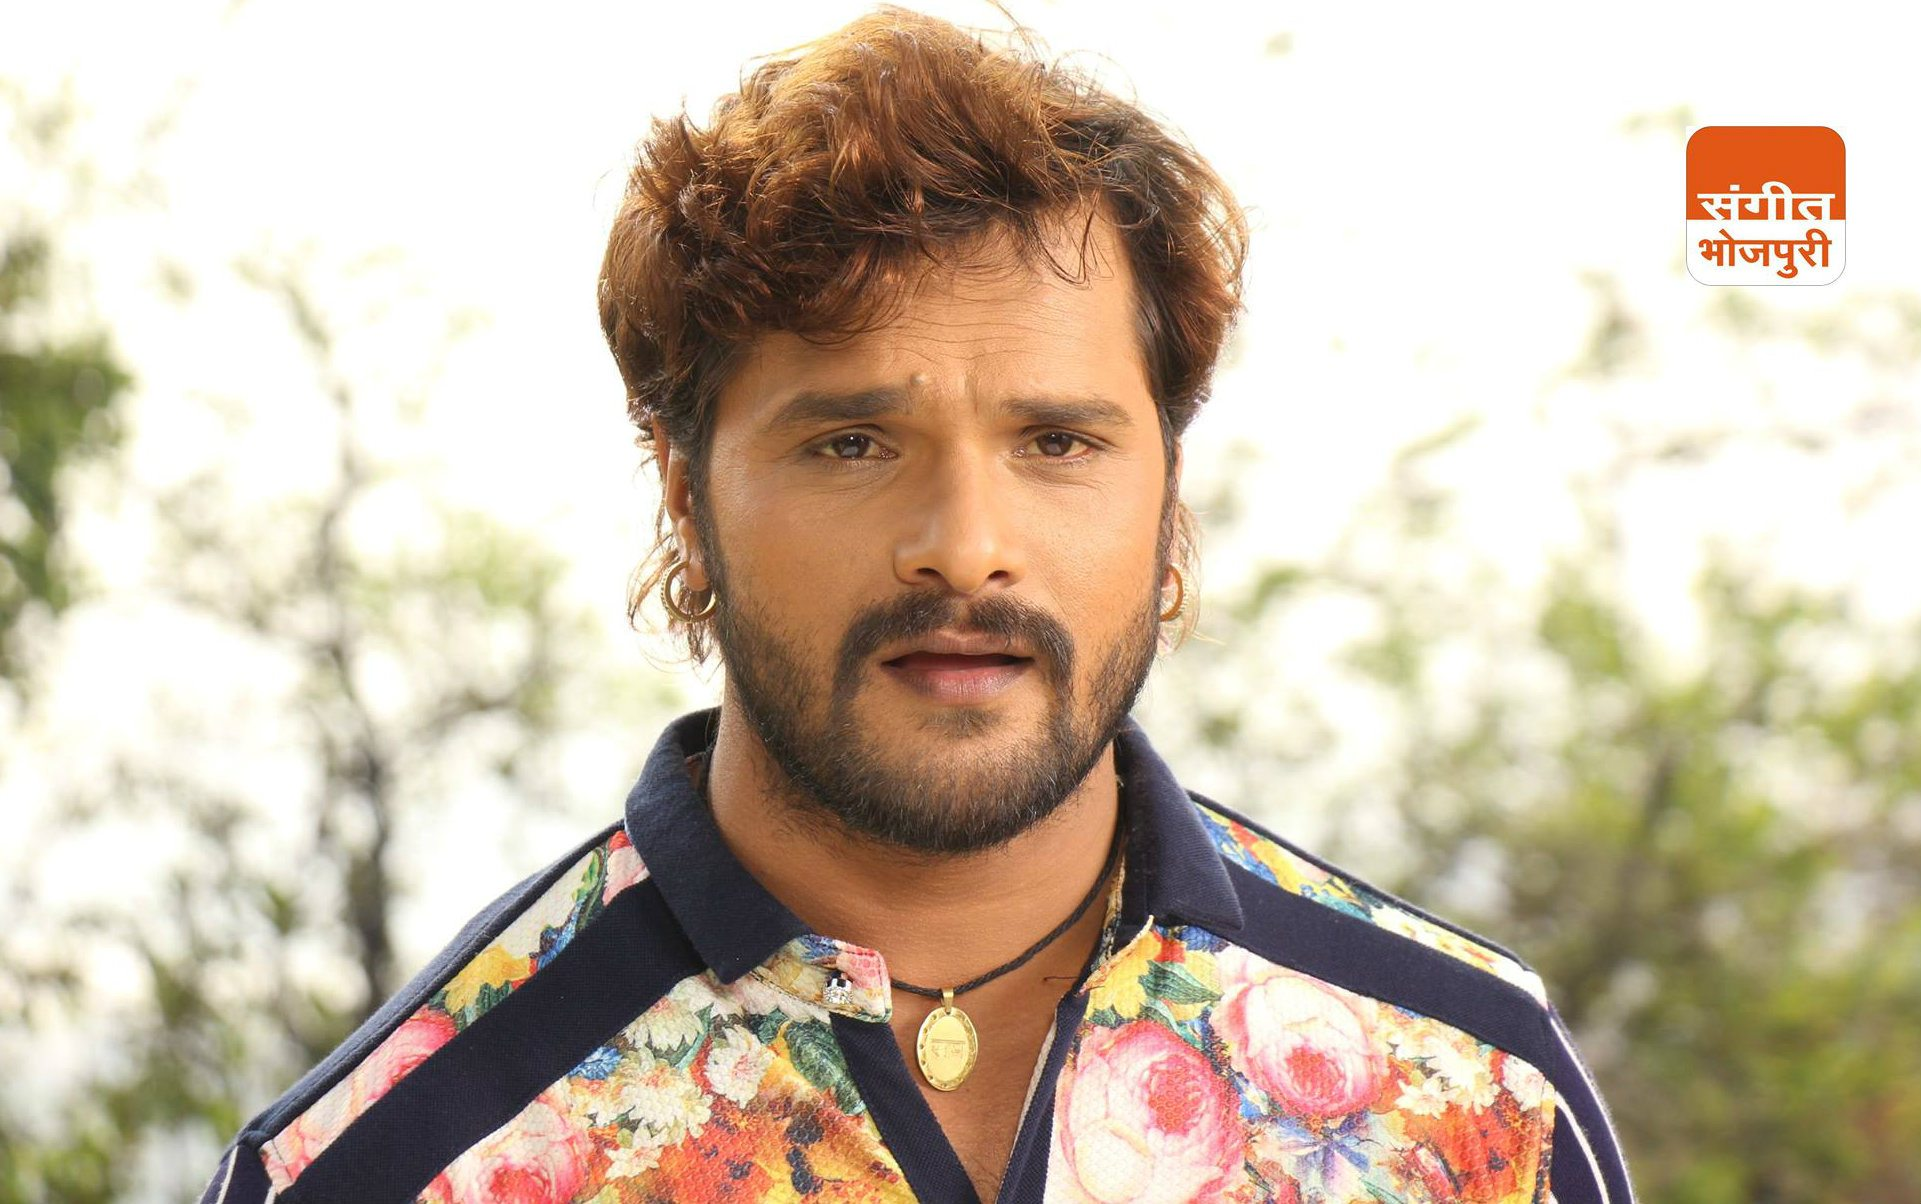 Khesari Lal Yadav Indian Actor, Singer